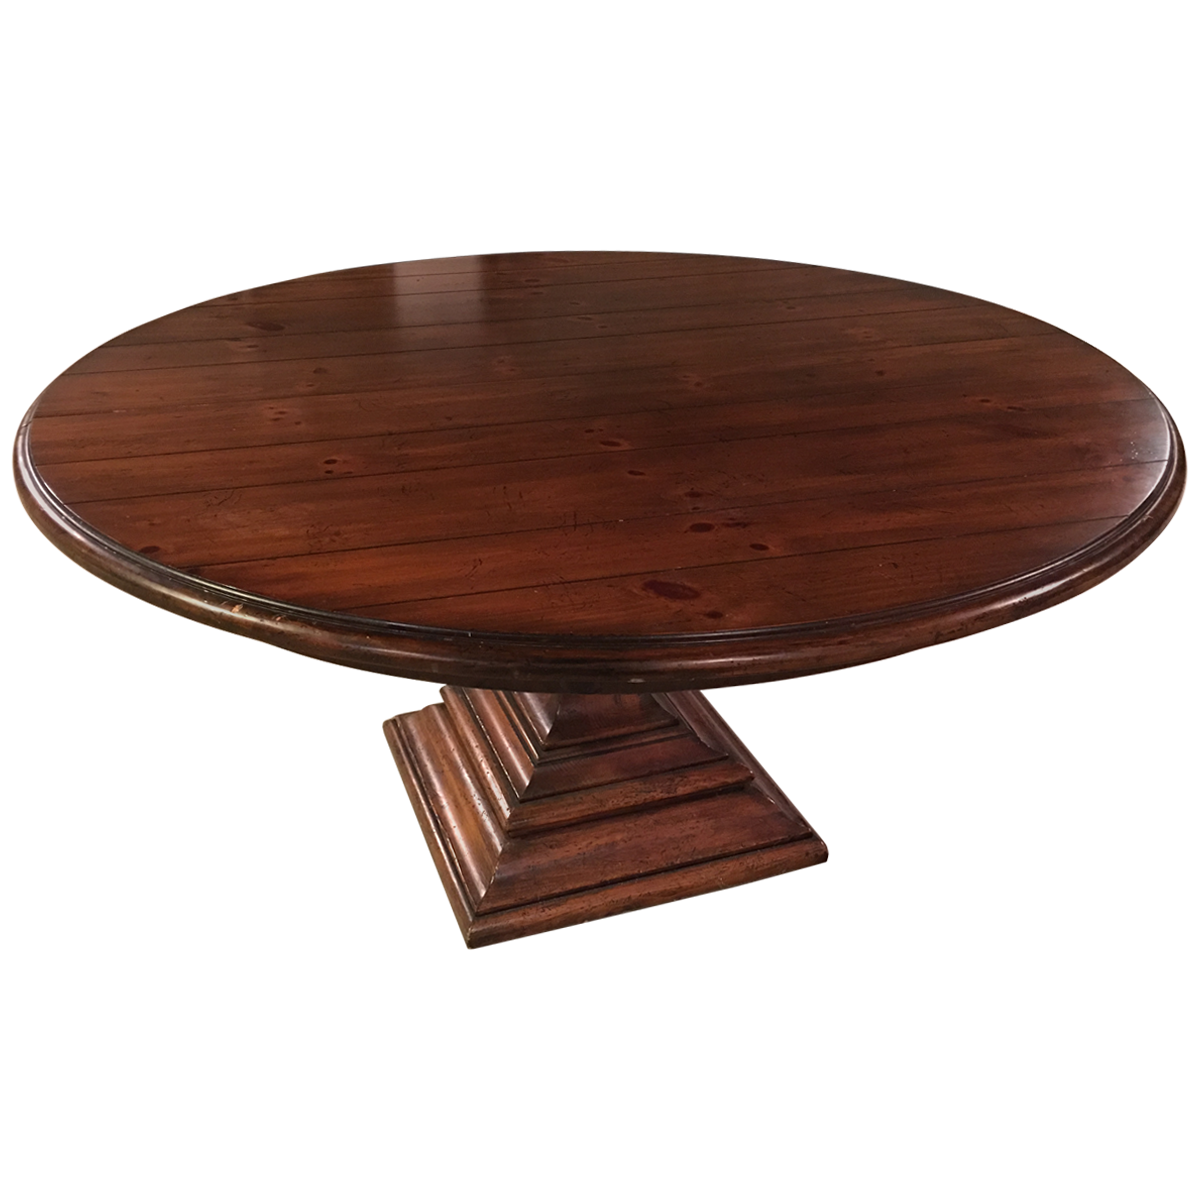 Viyet Designer Furniture Tables Ralph Lauren Rustic Dining Table Henredon